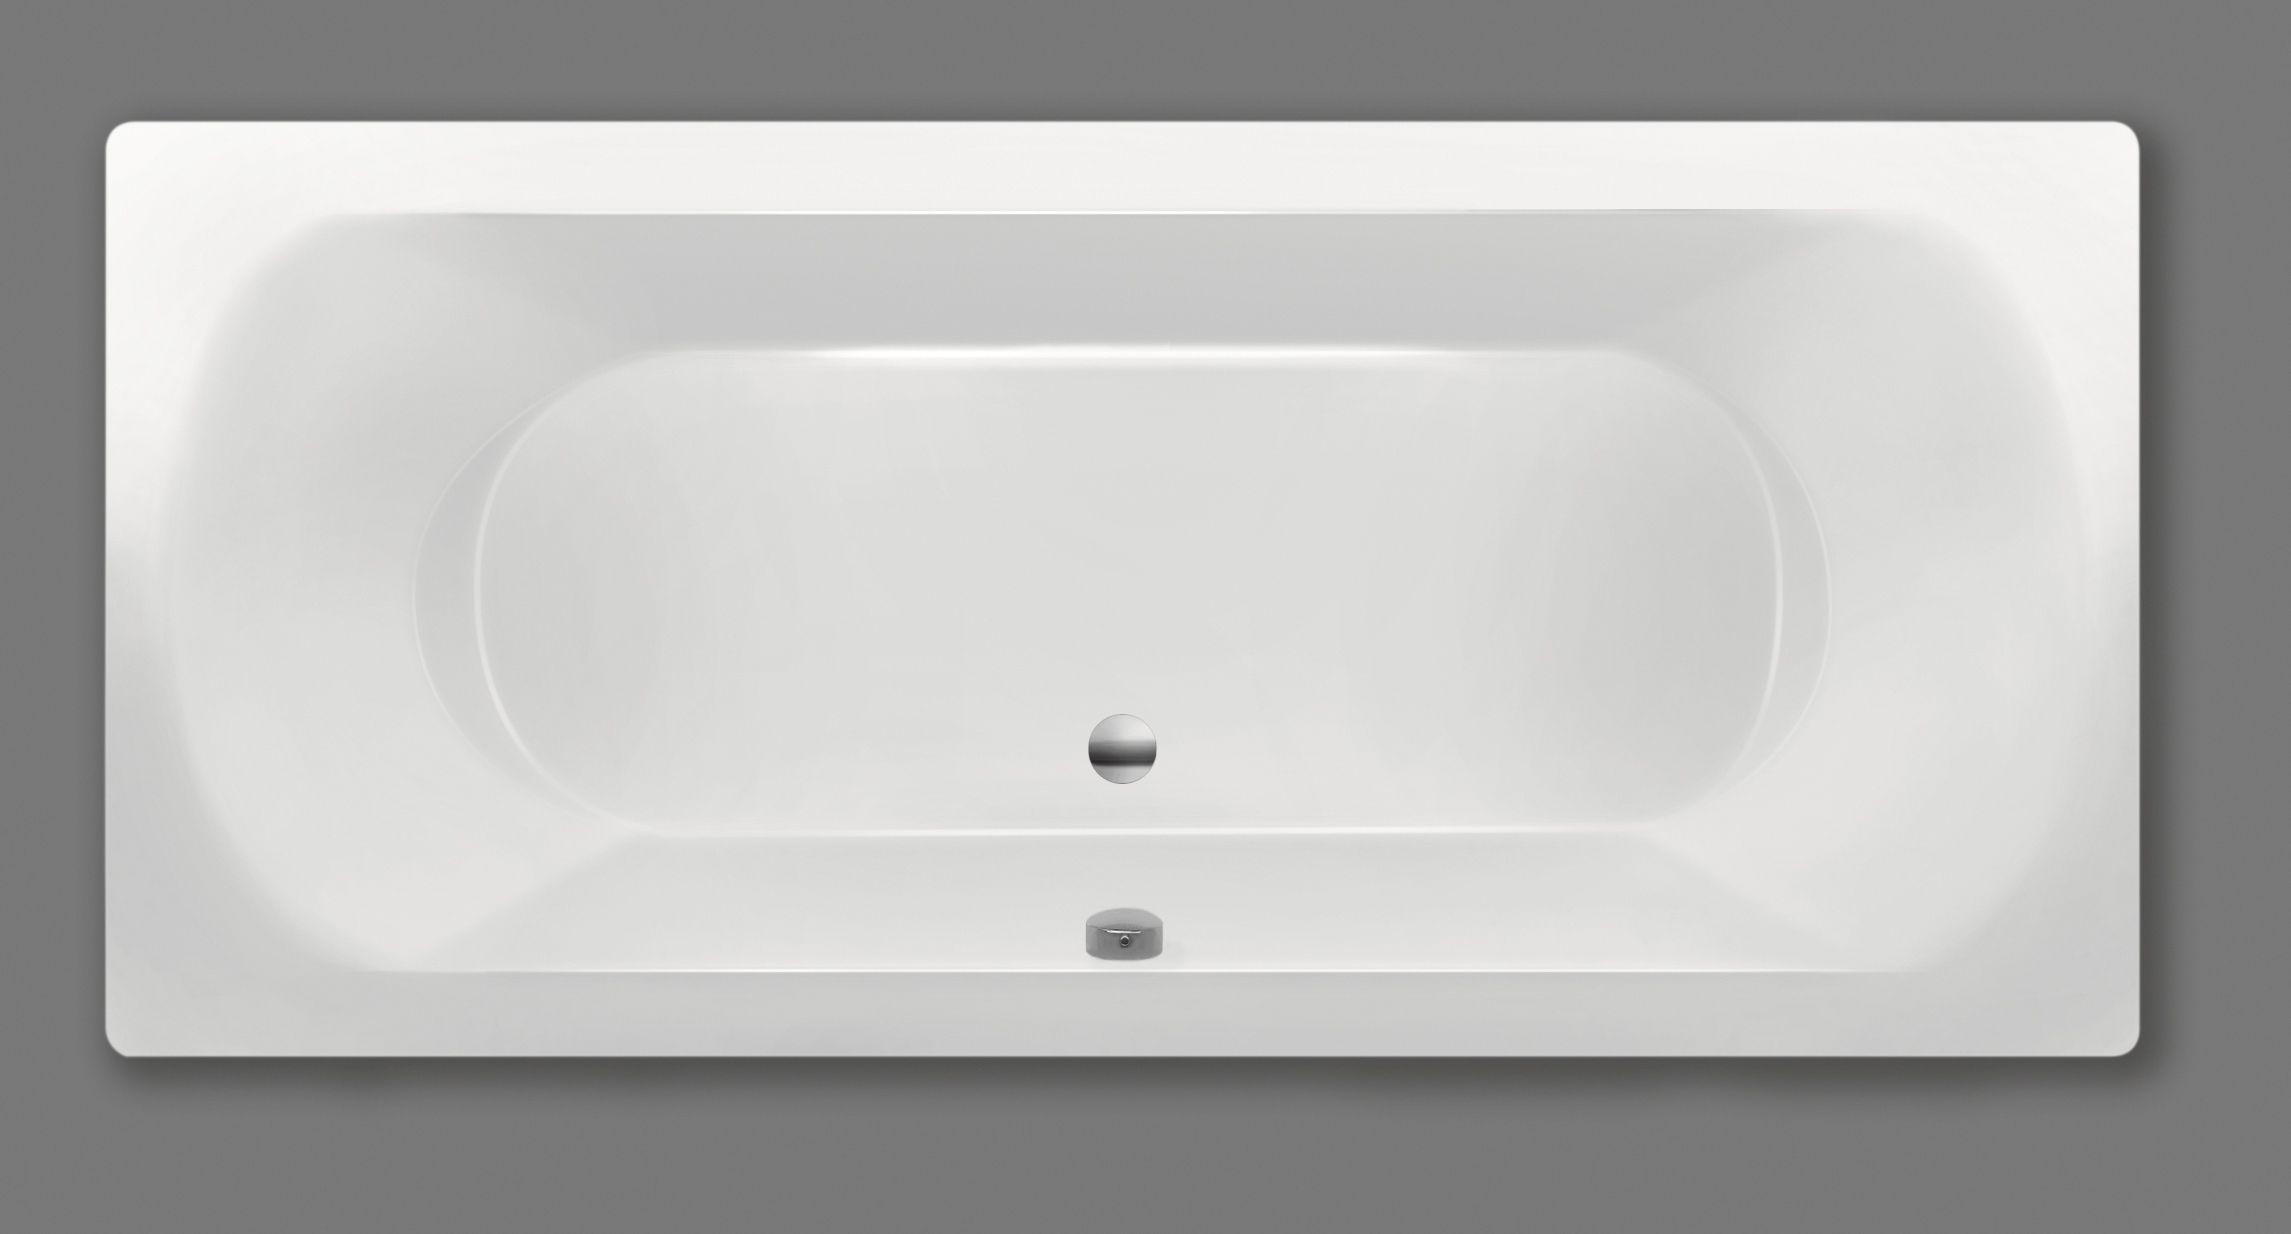 Productafbeelding van Xenz Lagoon badkuip 170x75x50cm créme